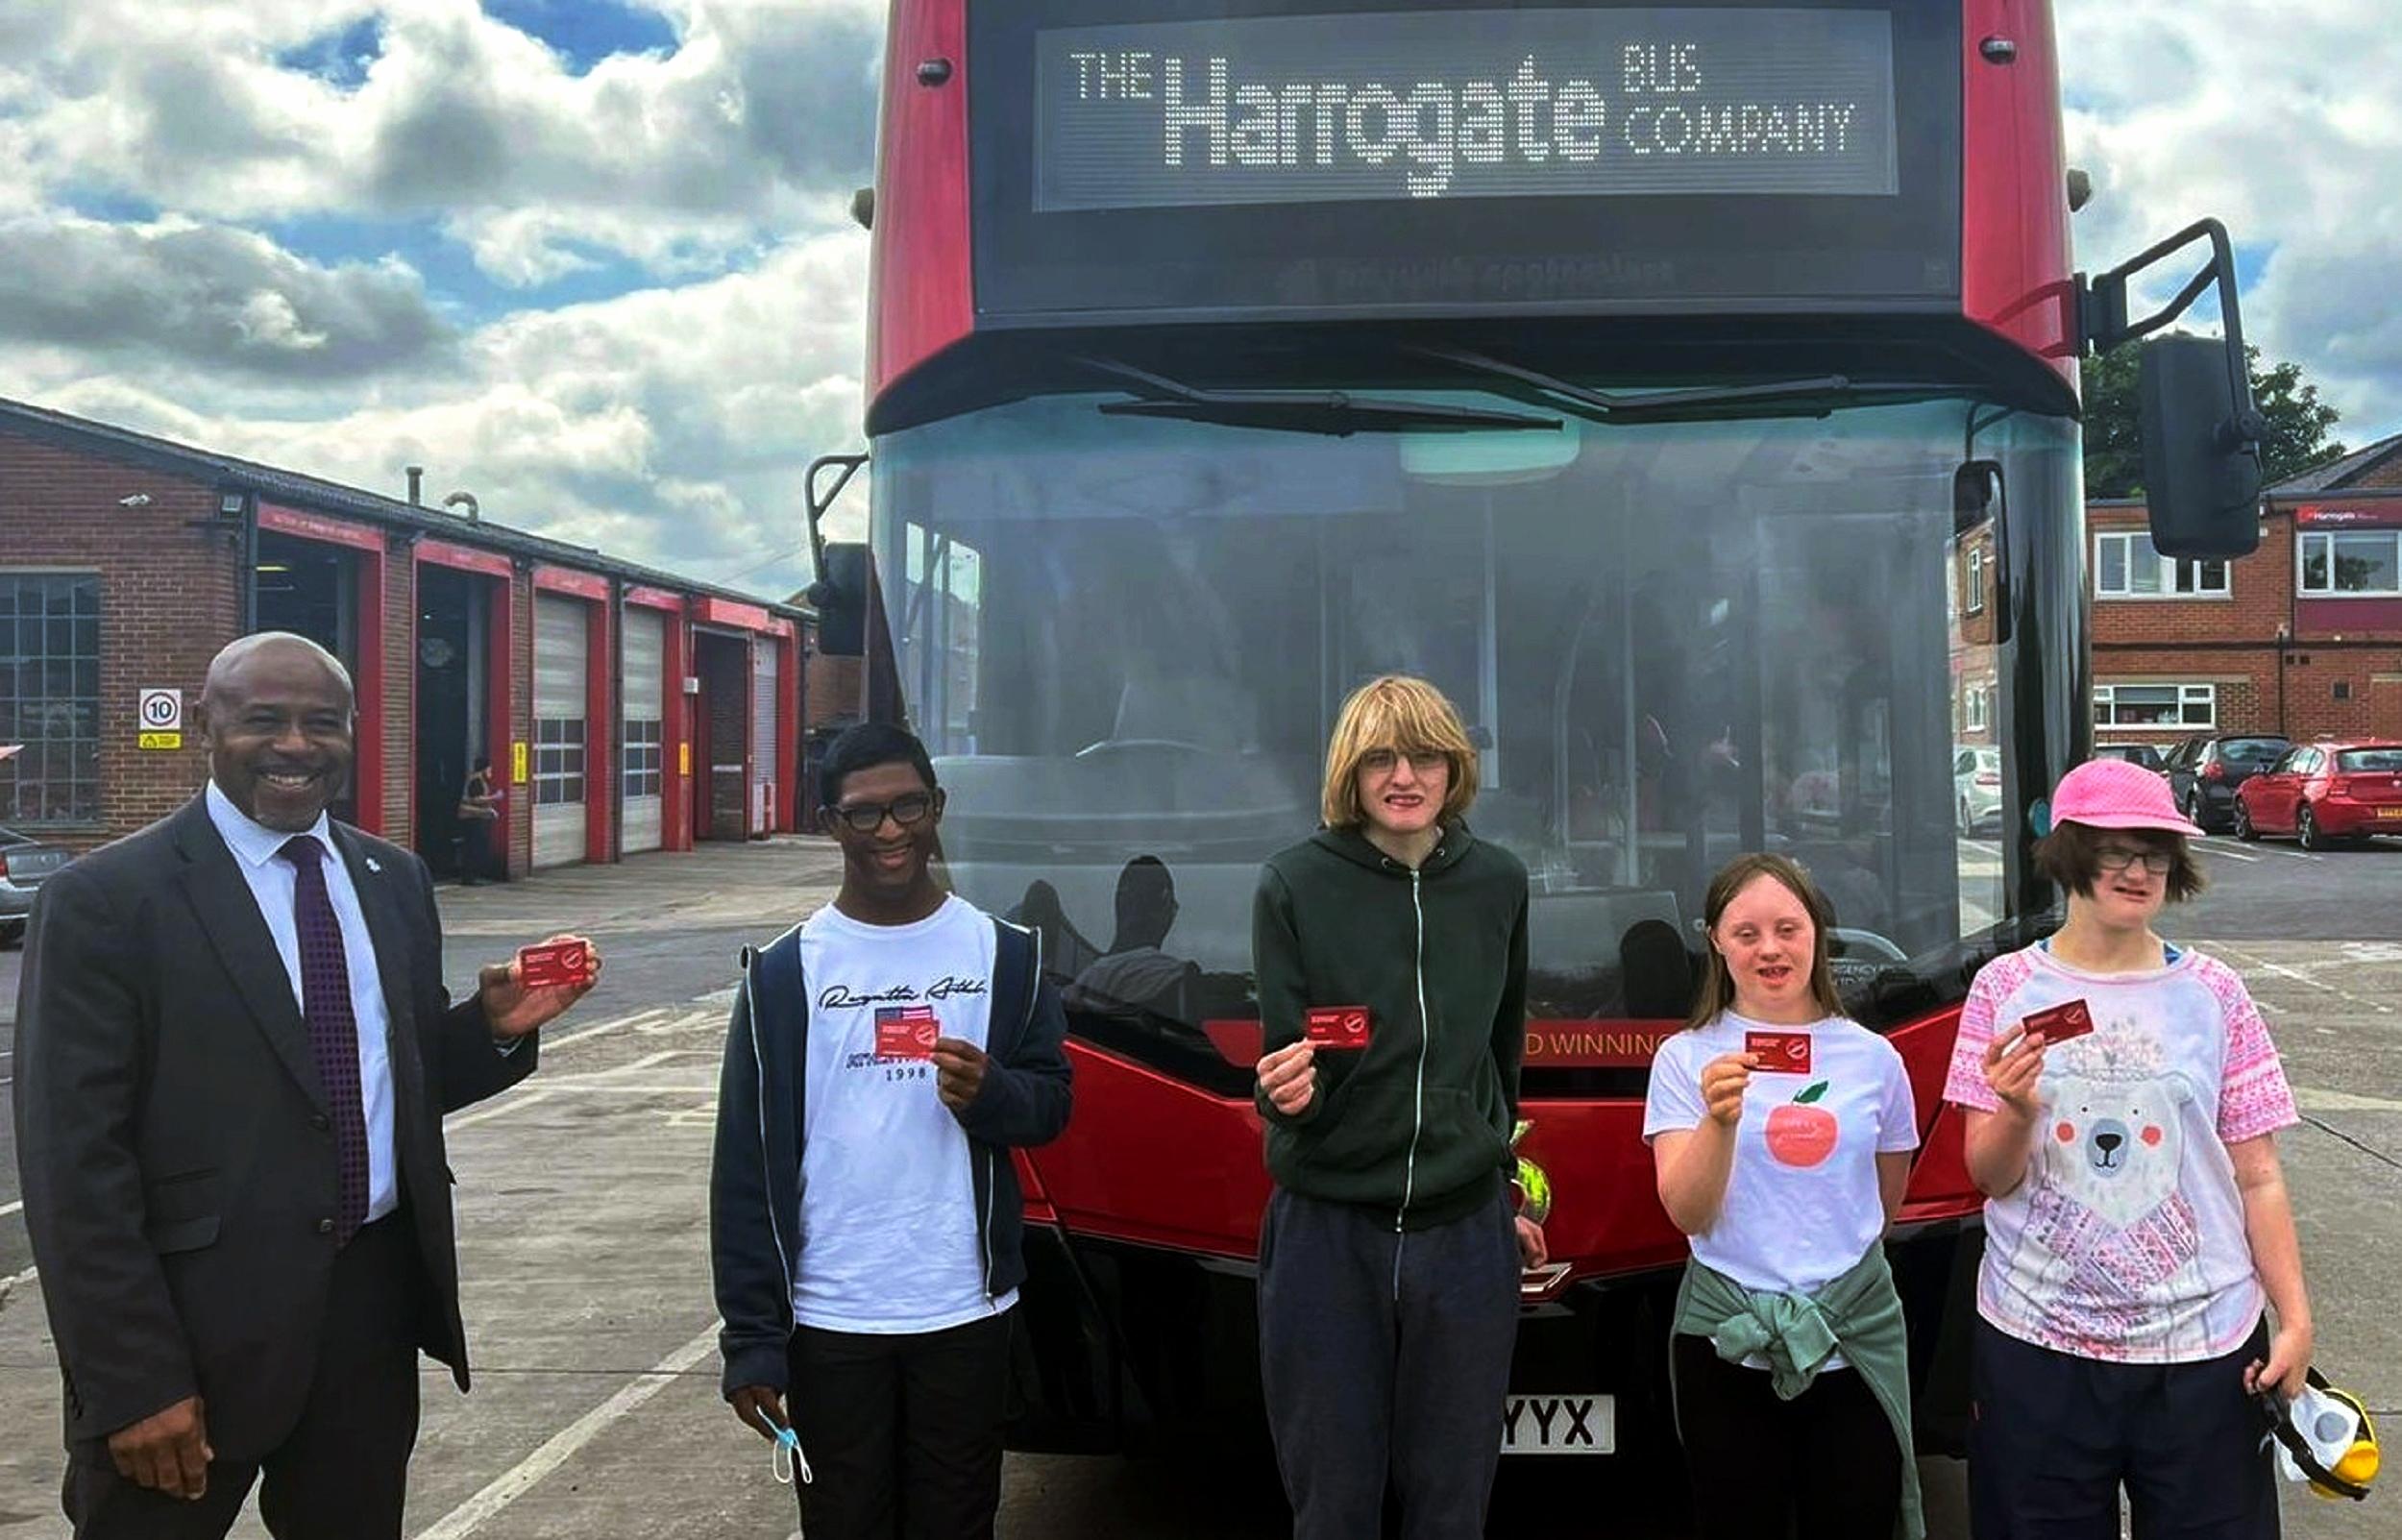 Harrogate Bus Company helps students